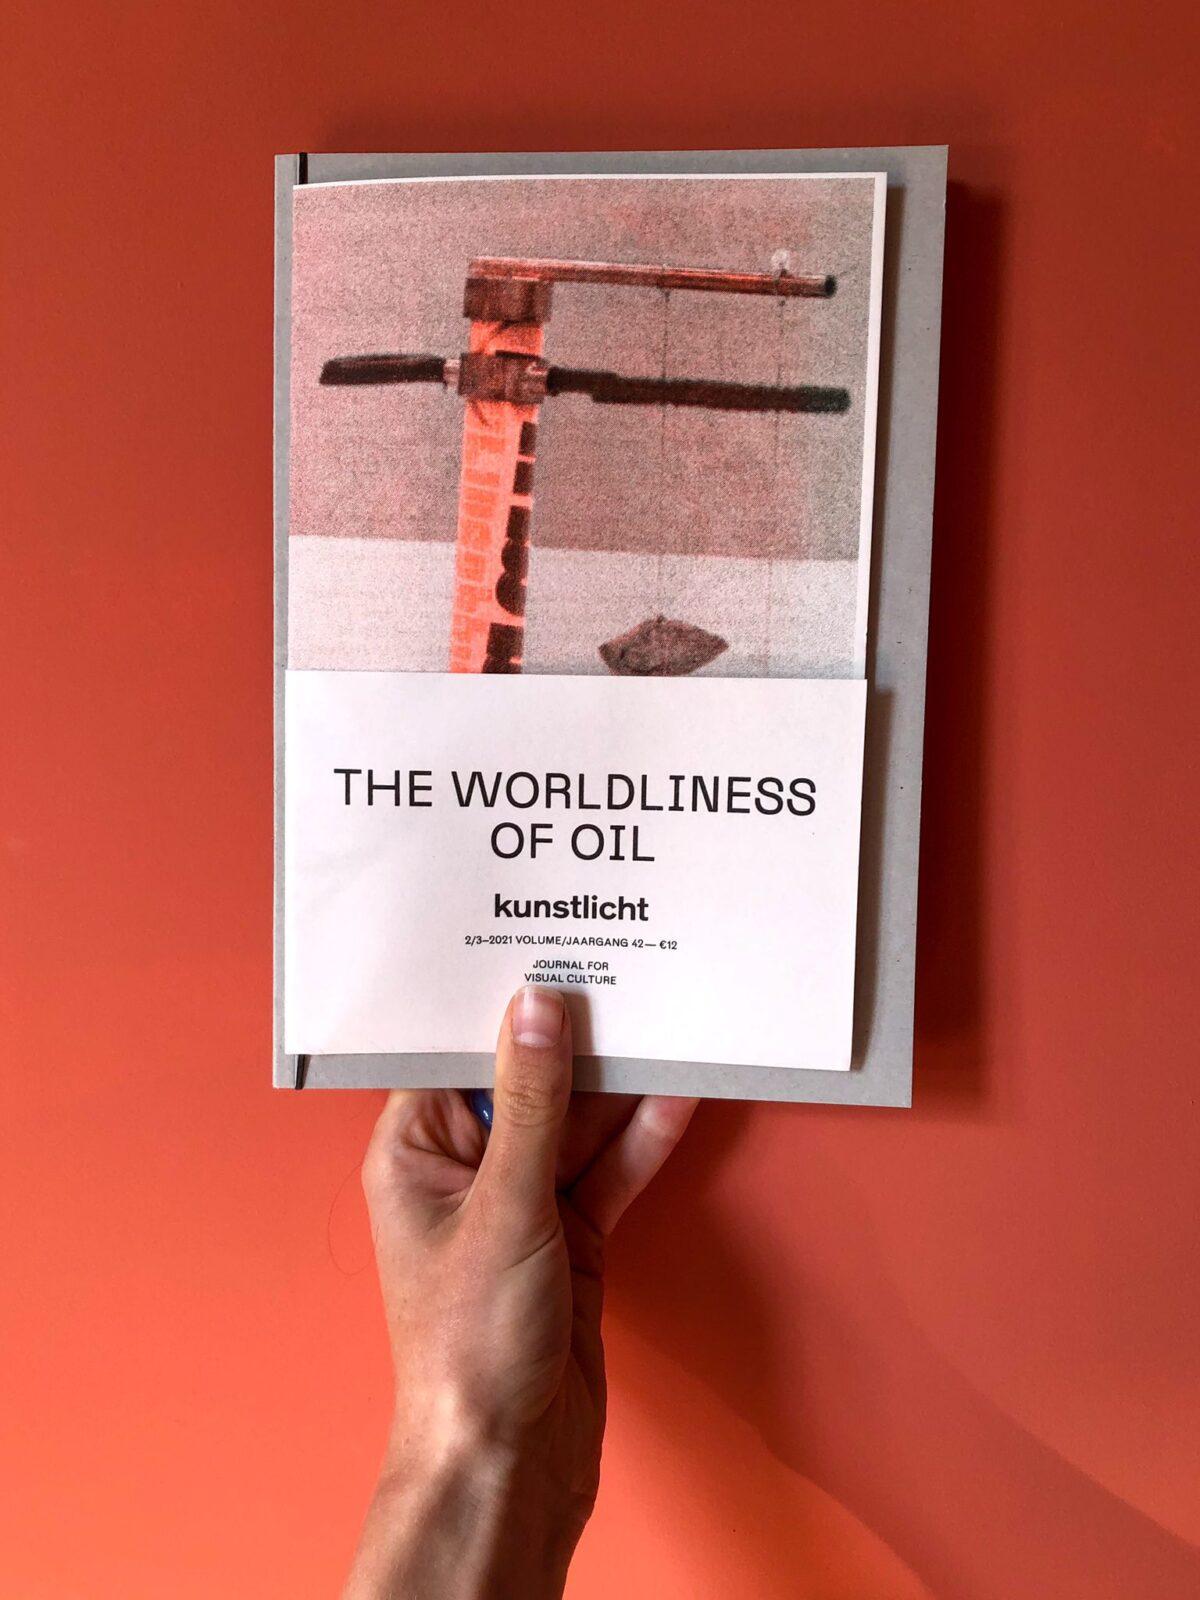 The Worldiness of Oil - Riso Wiso, Clementine Edwards, Kunstlicht